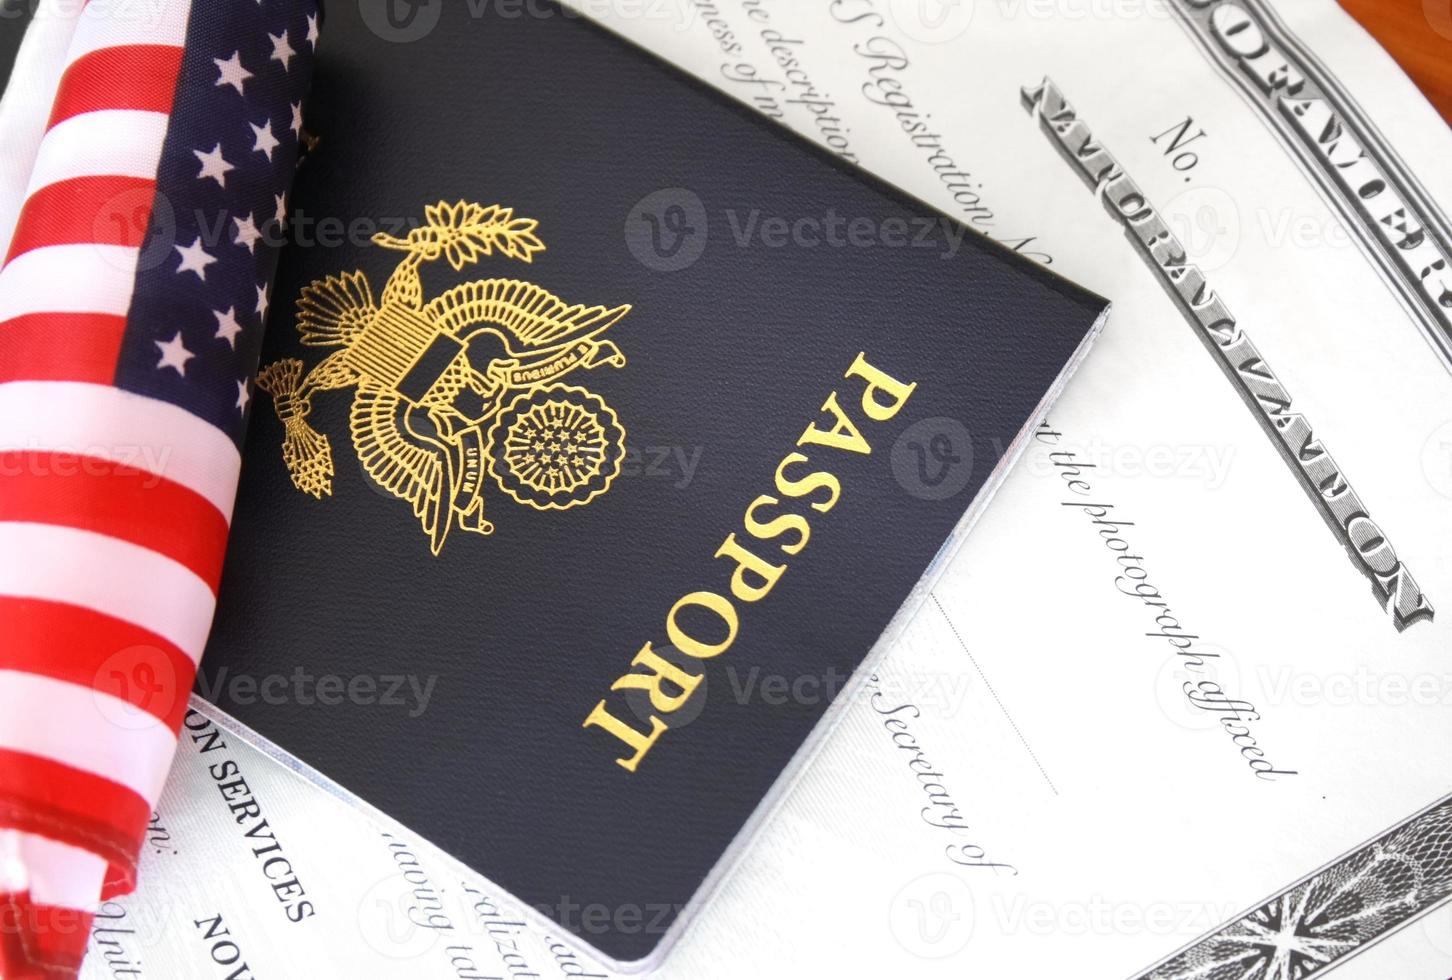 Citizenship documents photo